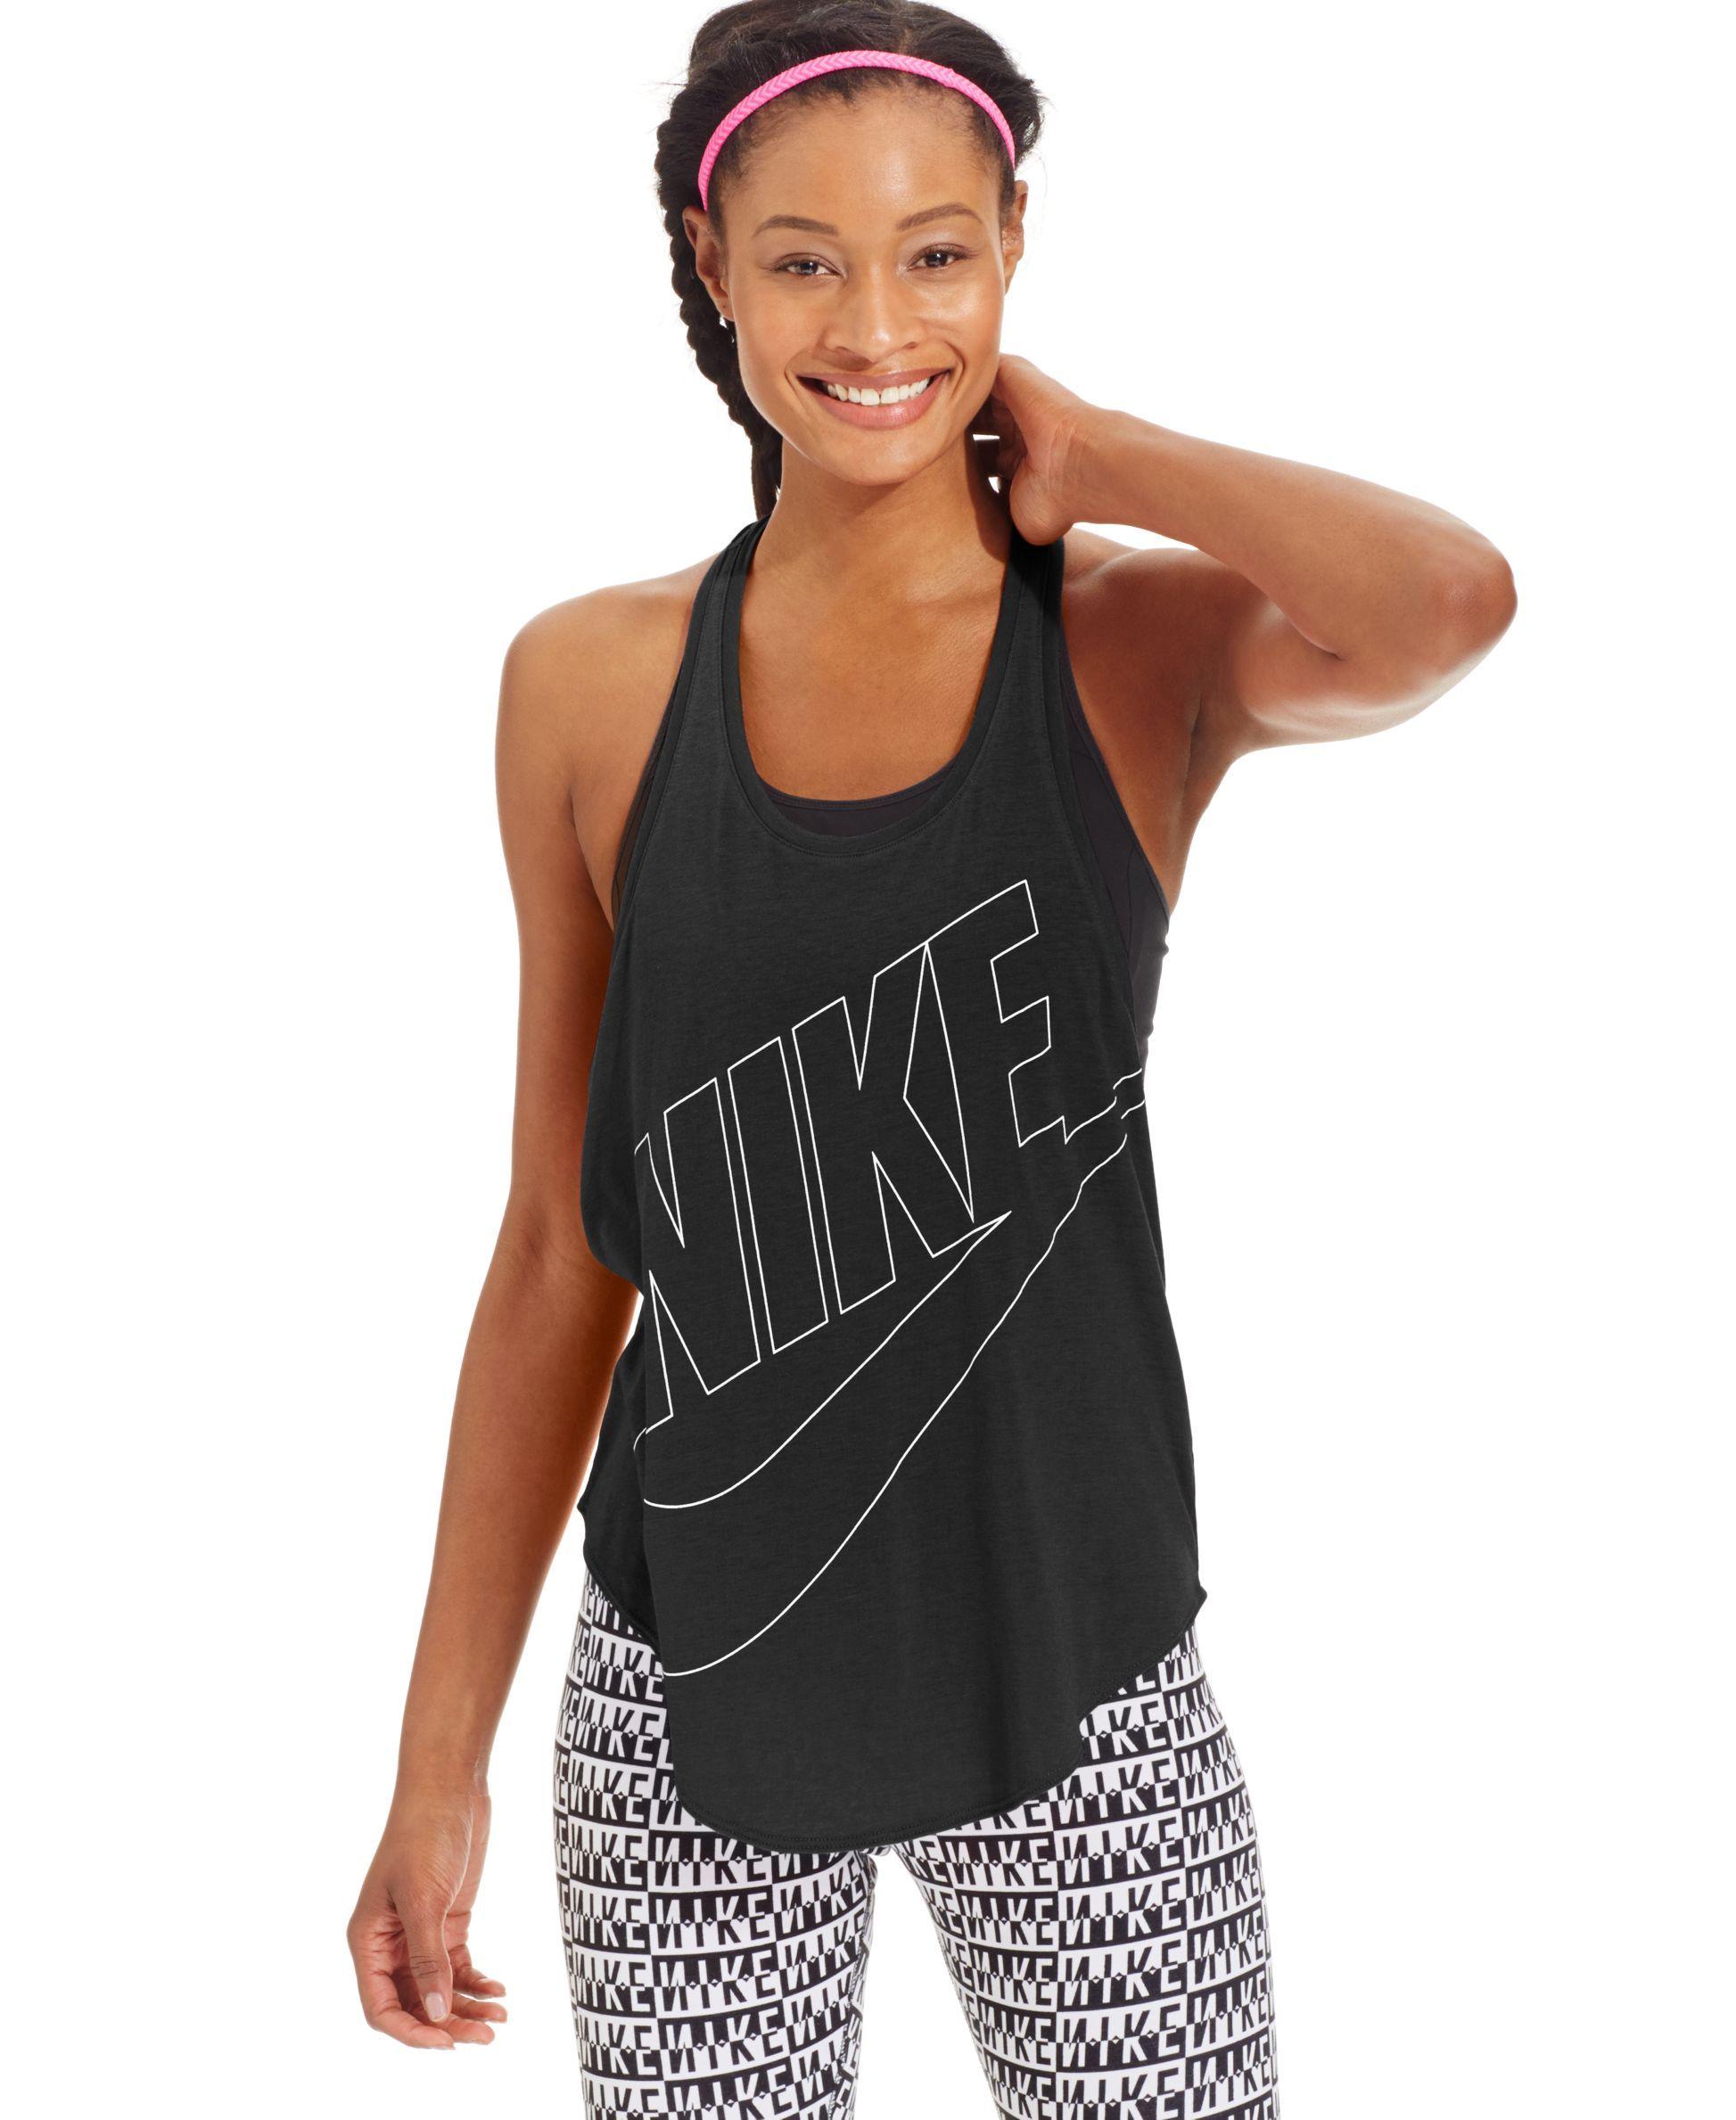 484addfaa5 Nike Graphic Tank Top - Tops - Women - Macy s